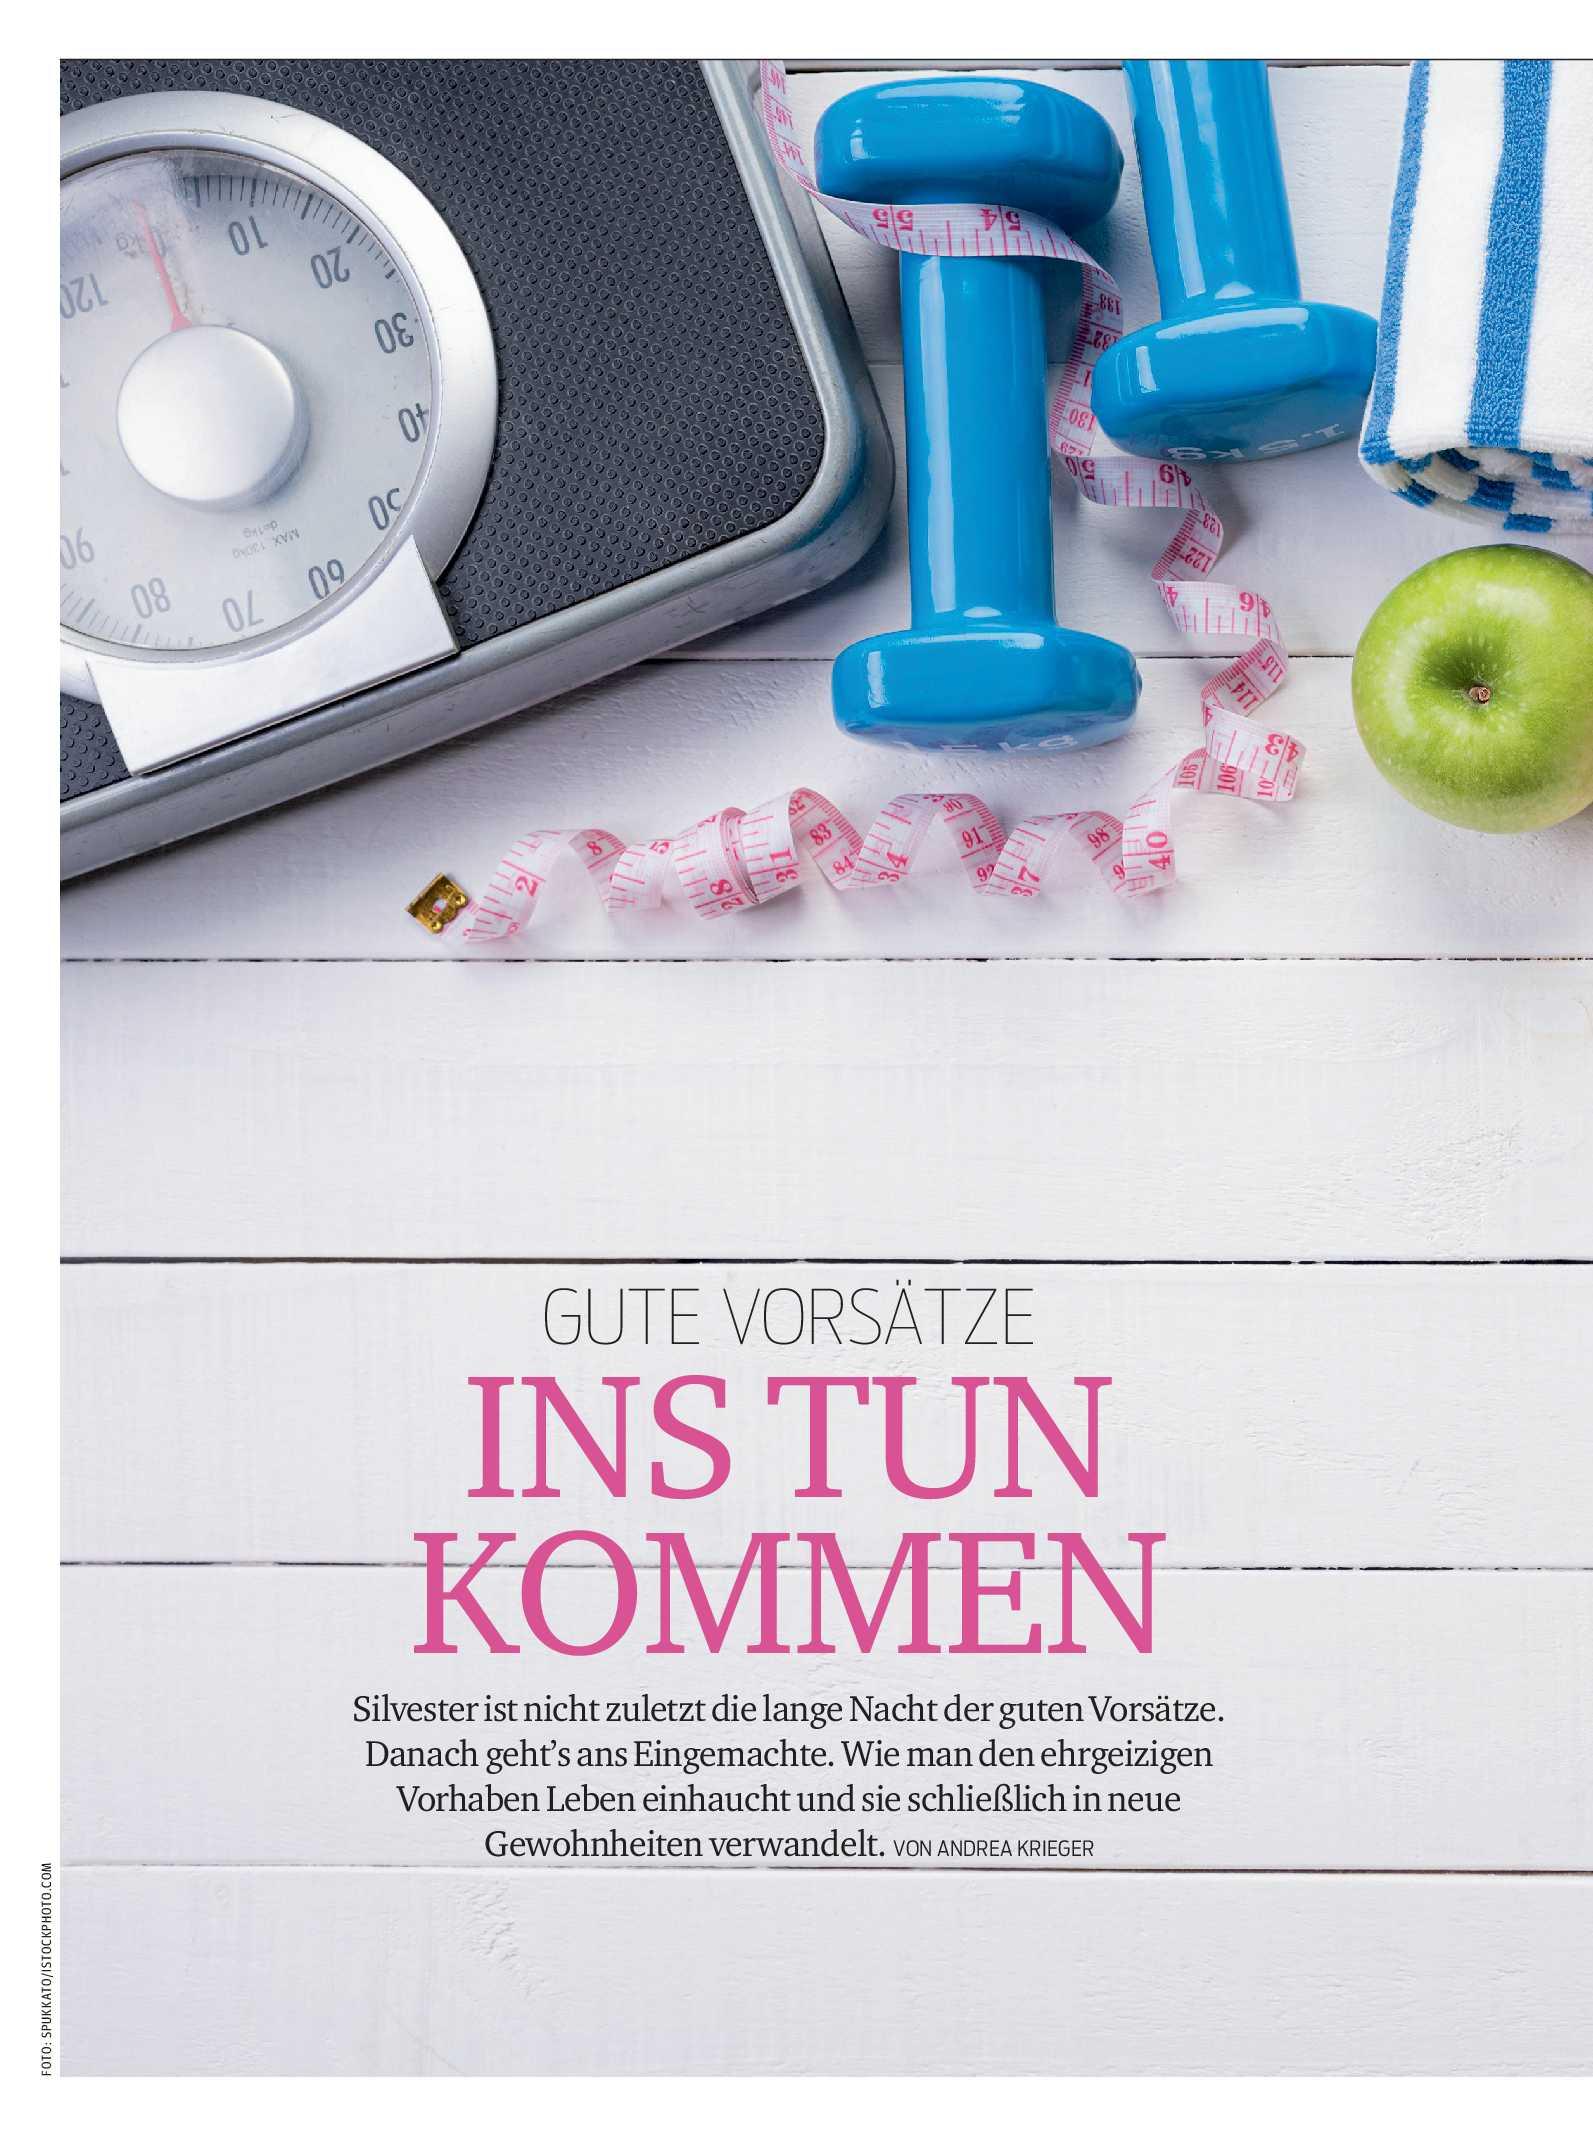 public/epaper/imported/20201125/kurier/magazin/magazin_20201125_122.jpg